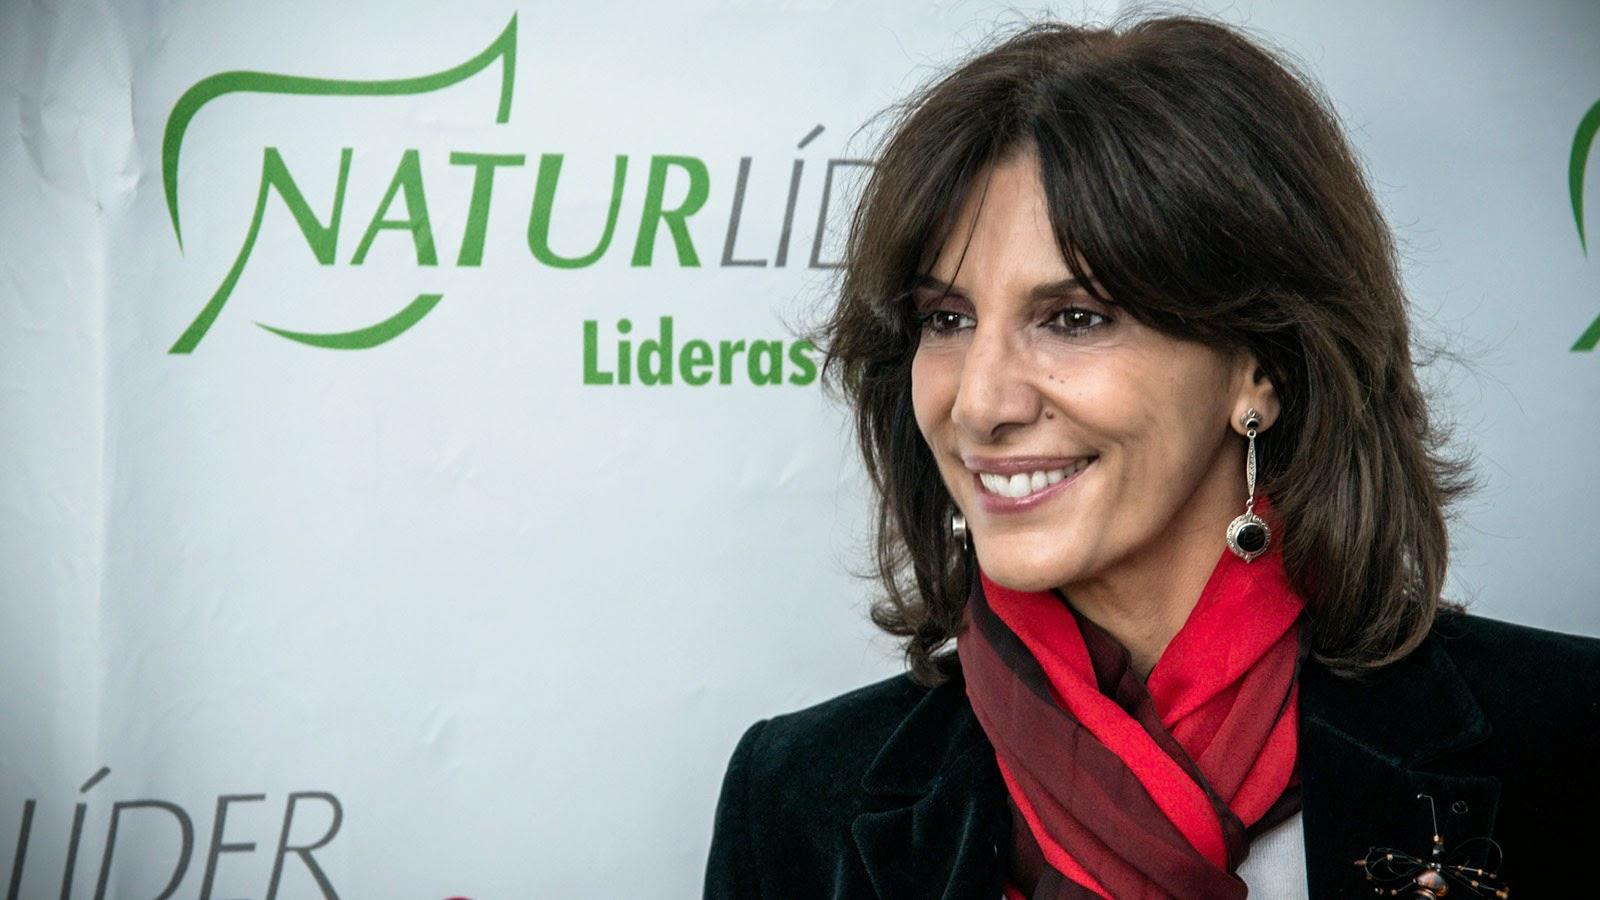 Naturlíder, Yo me quiero, Flagship Store, Goya 57, Lifestyle, Coaching,  Carmen Hummer, Blogger